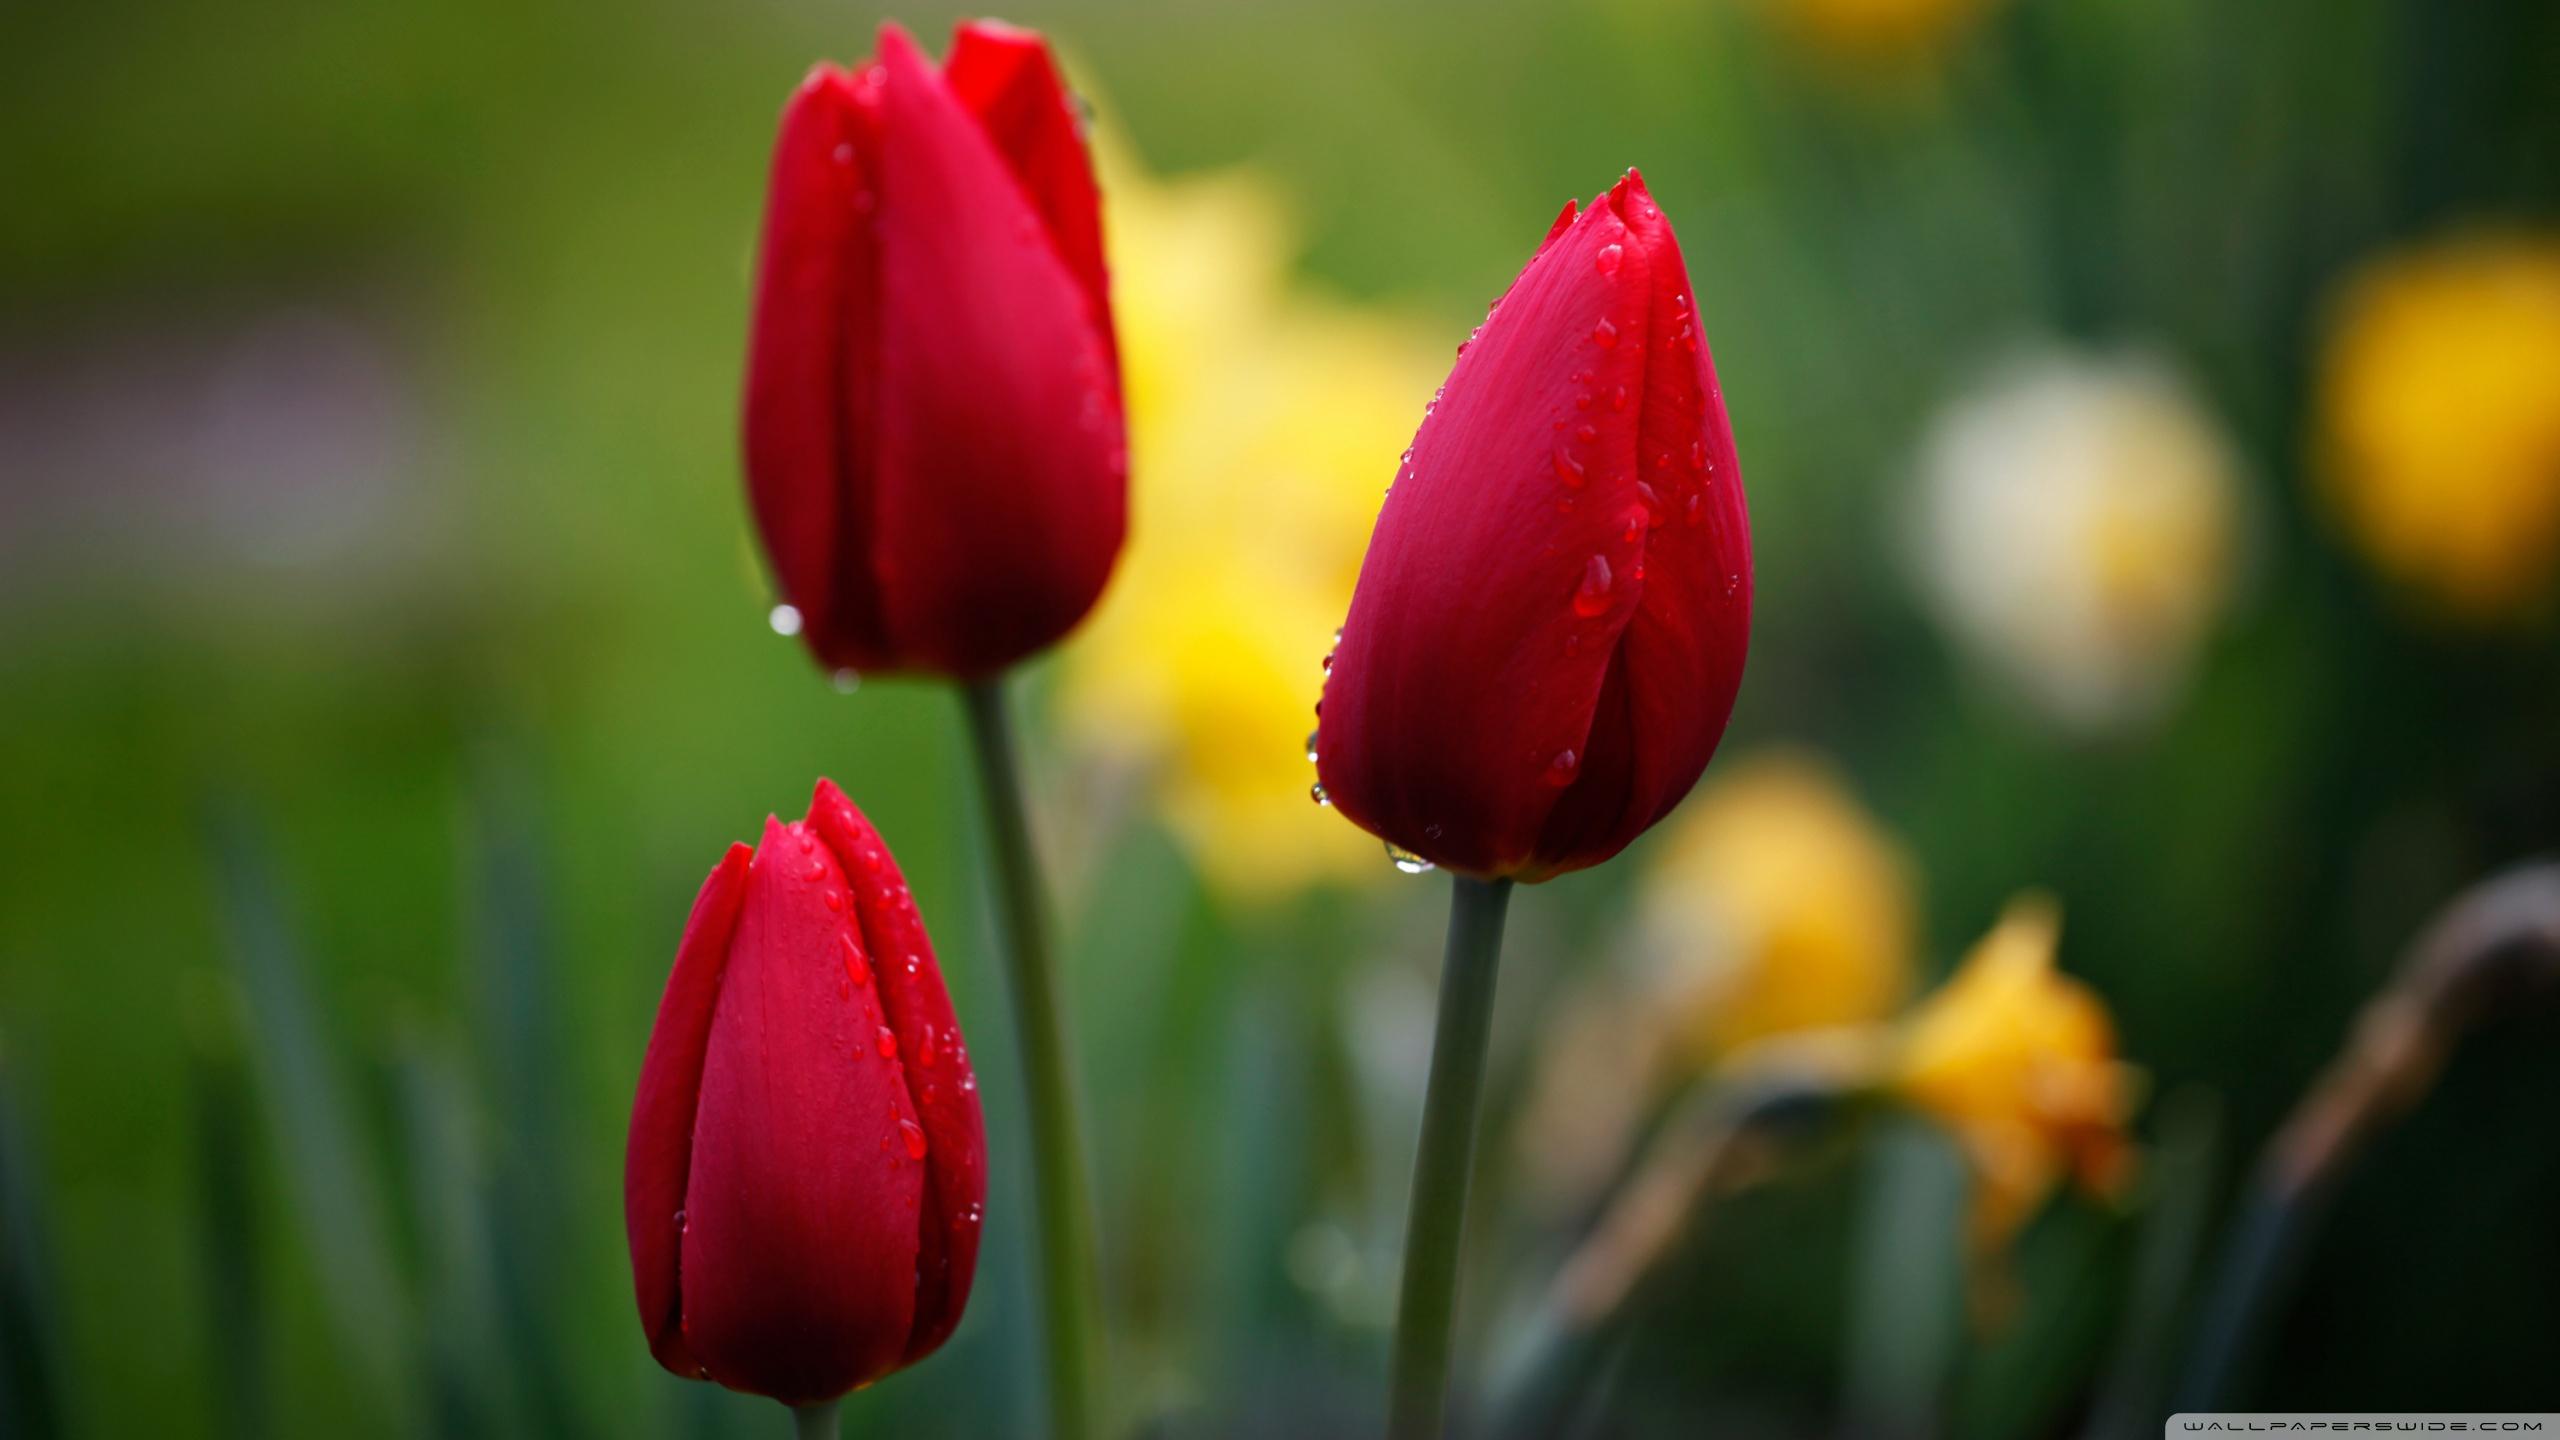 Three Red Tulips ❤ 4K HD Desktop Wallpaper for 4K Ultra HD TV ...